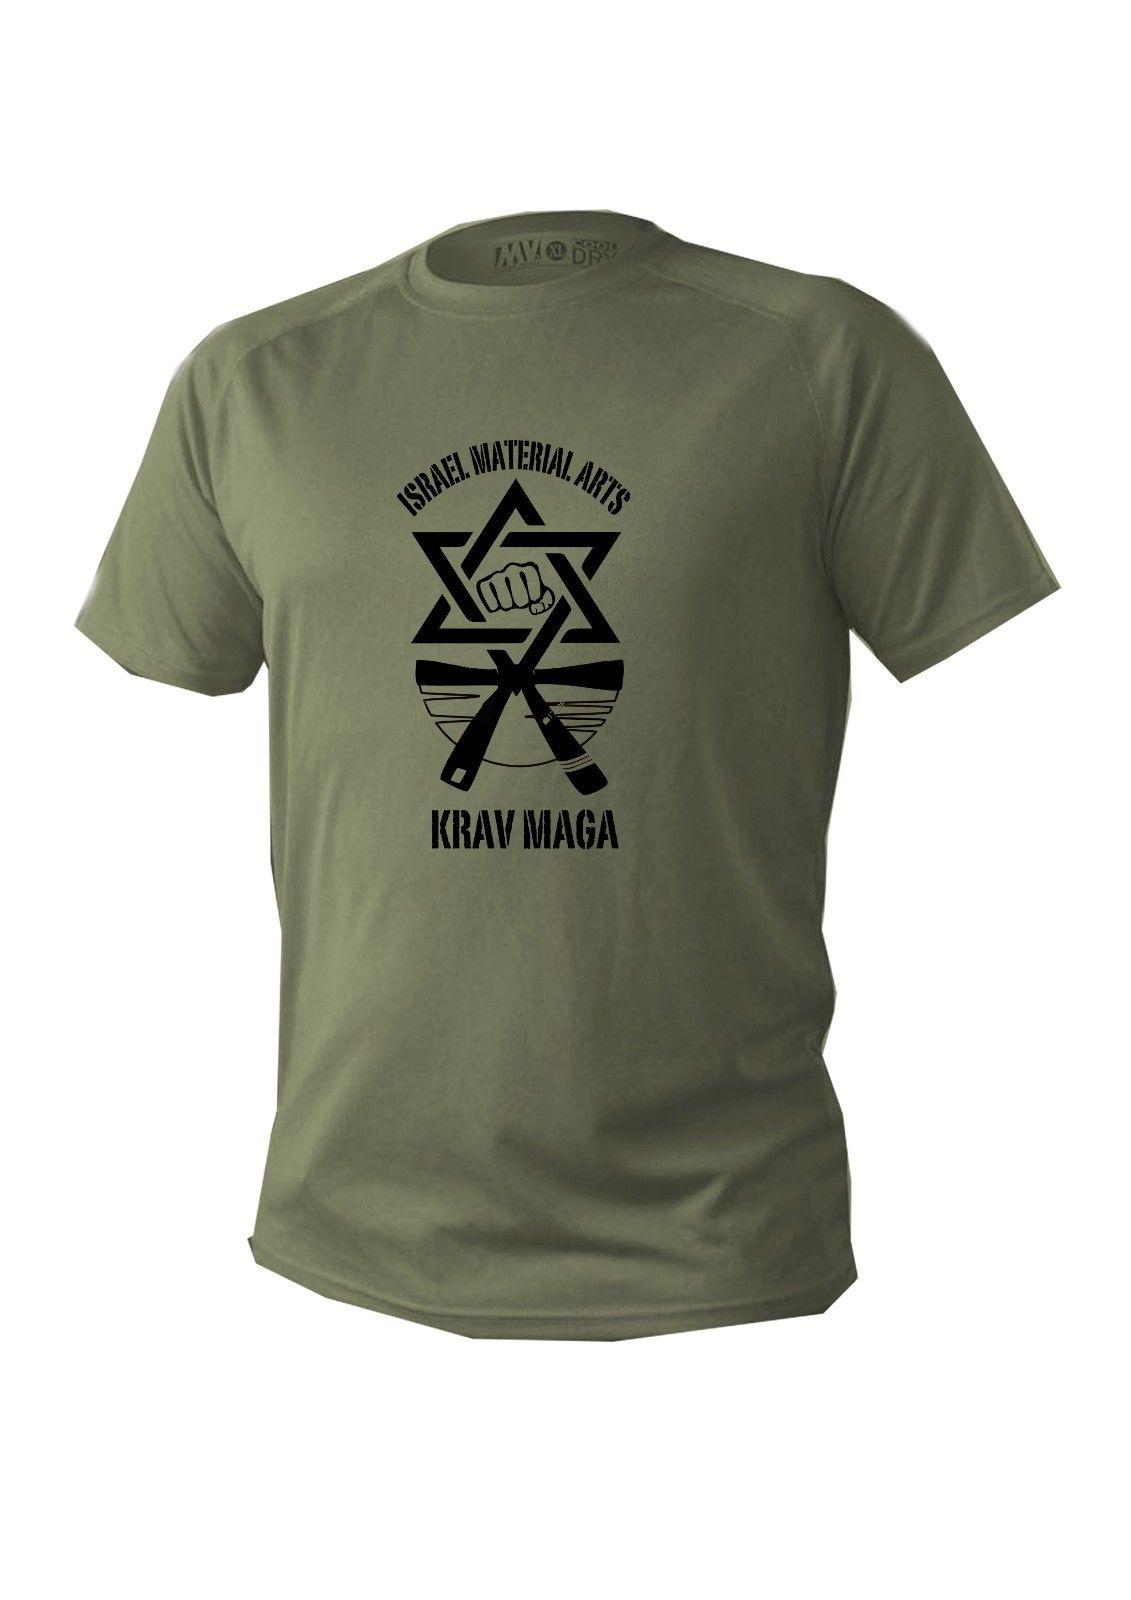 Krav Maga Israel Israeli jew martial self  defense art train symbol logo t-shirt